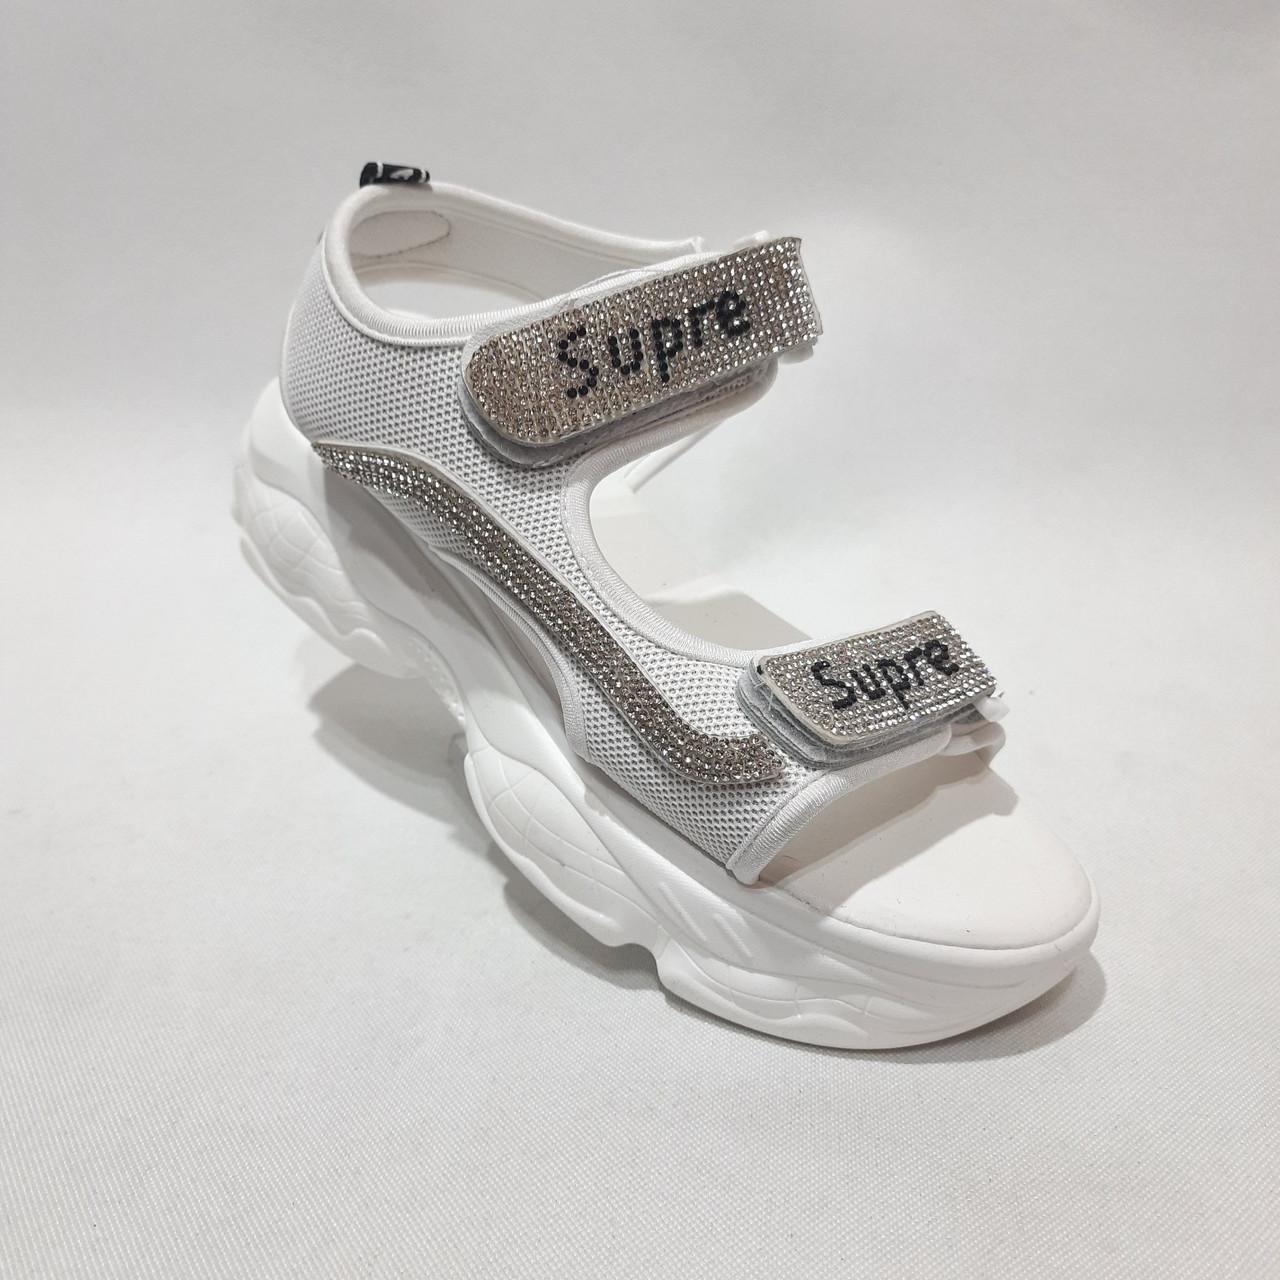 Босоножки женские, сандали летние на толстой подошве белые